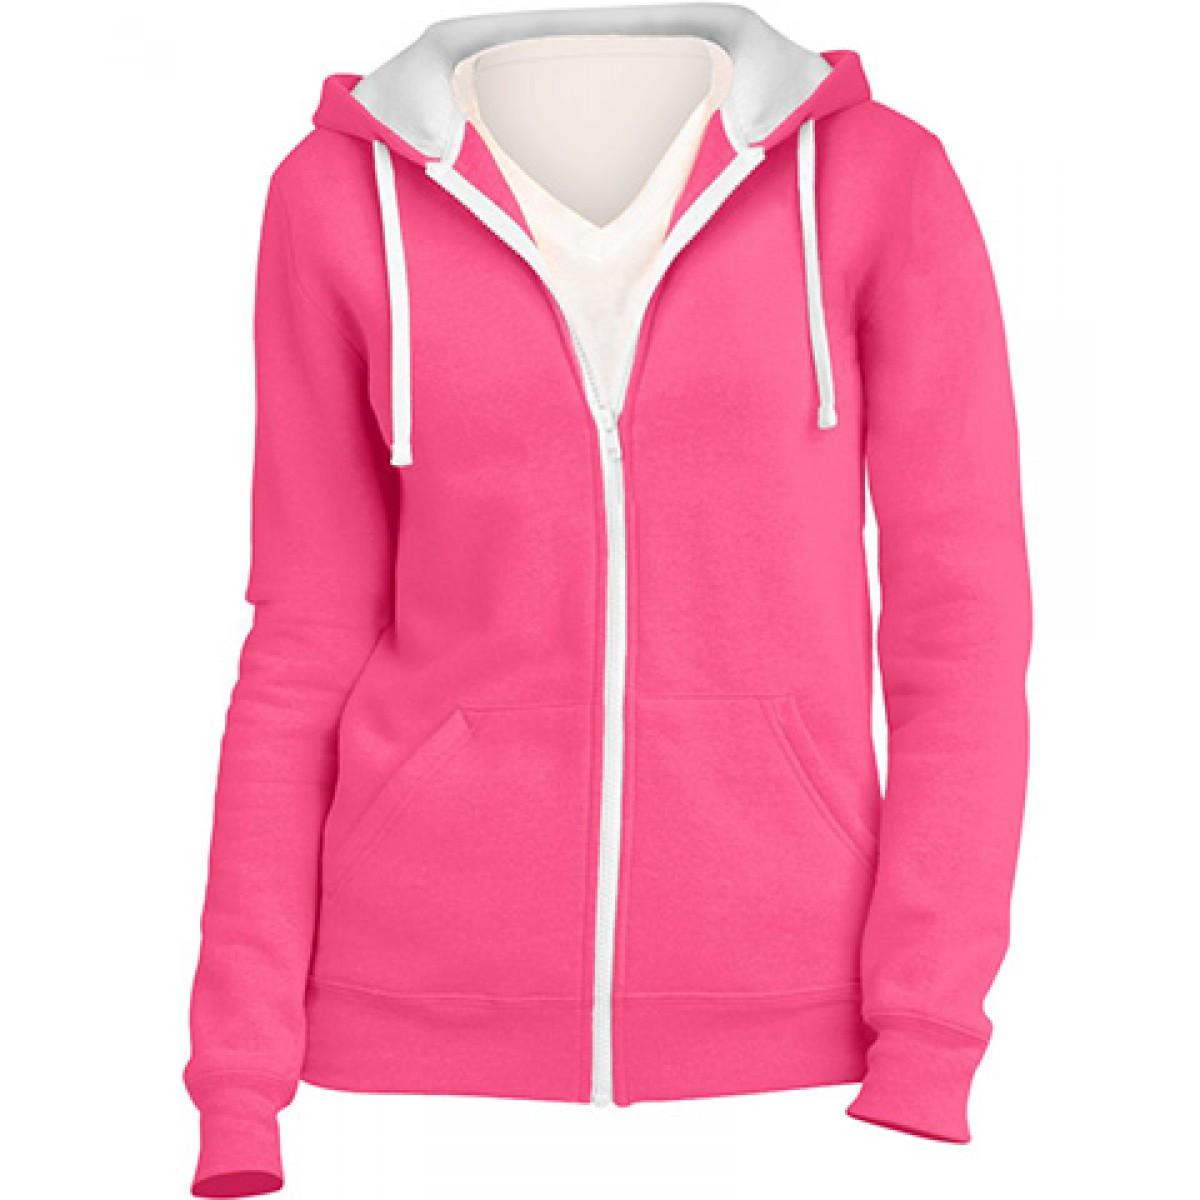 Juniors Full-Zip Hoodie-Neon Pink-M